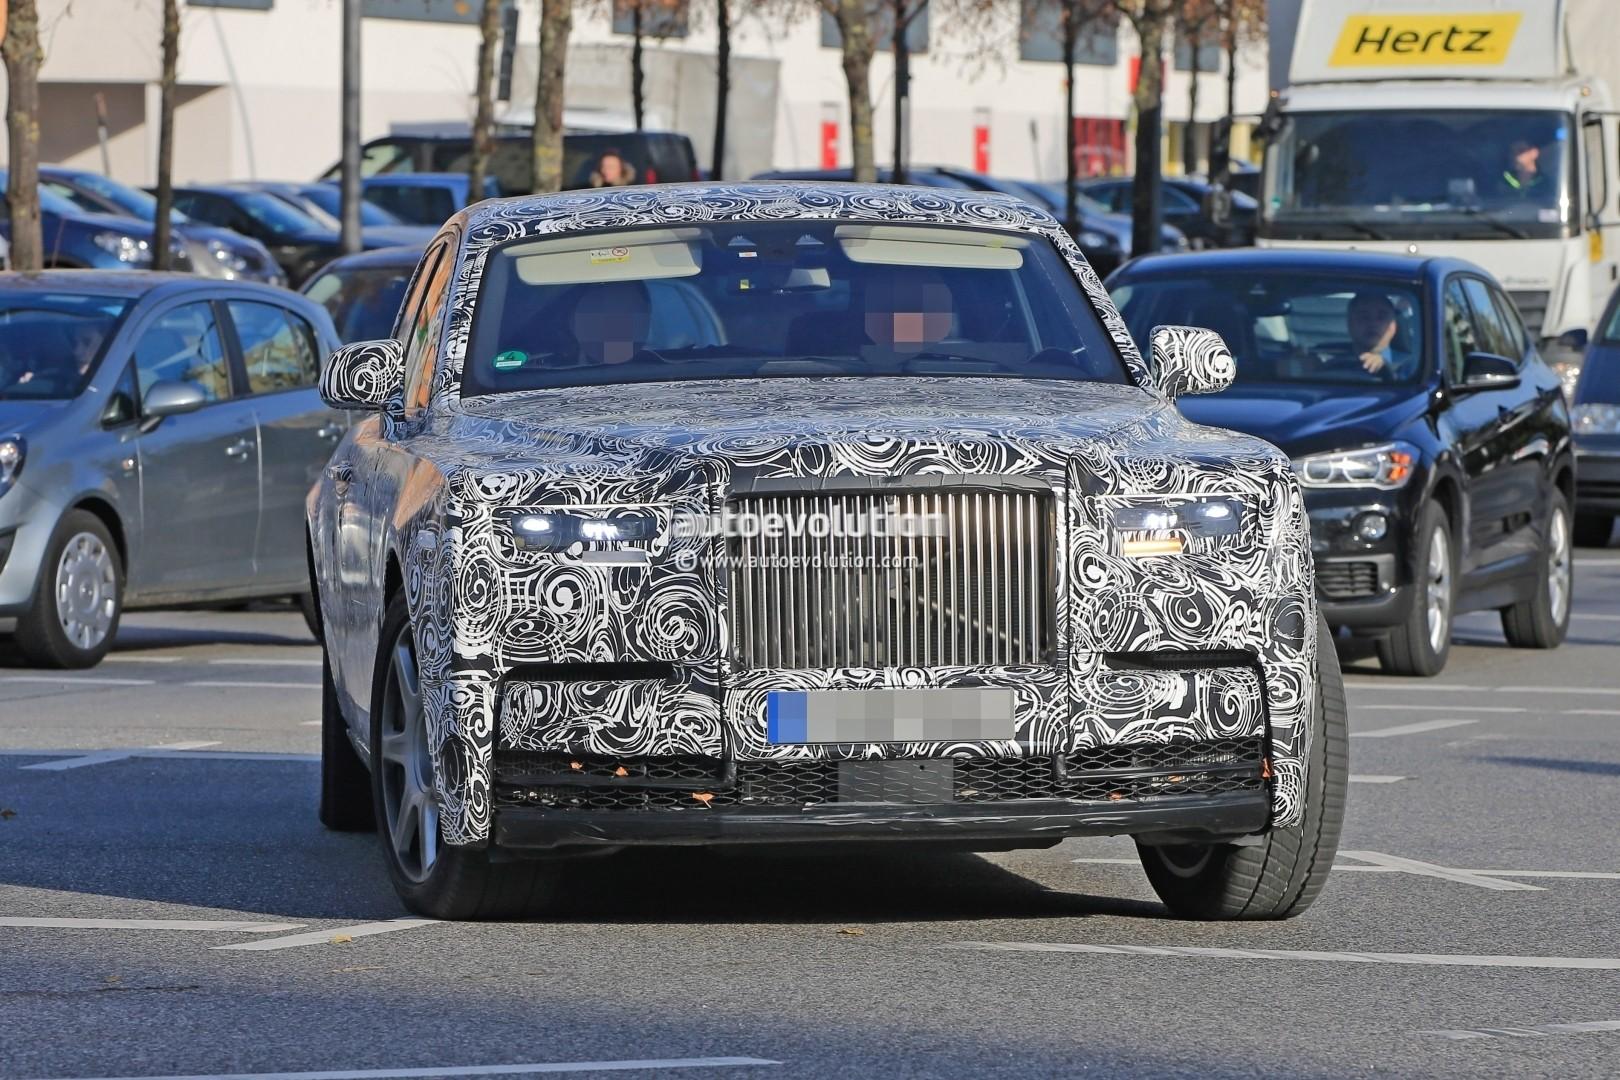 2018 Rolls-Royce Phantom Spotted in German Traffic, Doesn't Hide Its Opulence - autoevolution